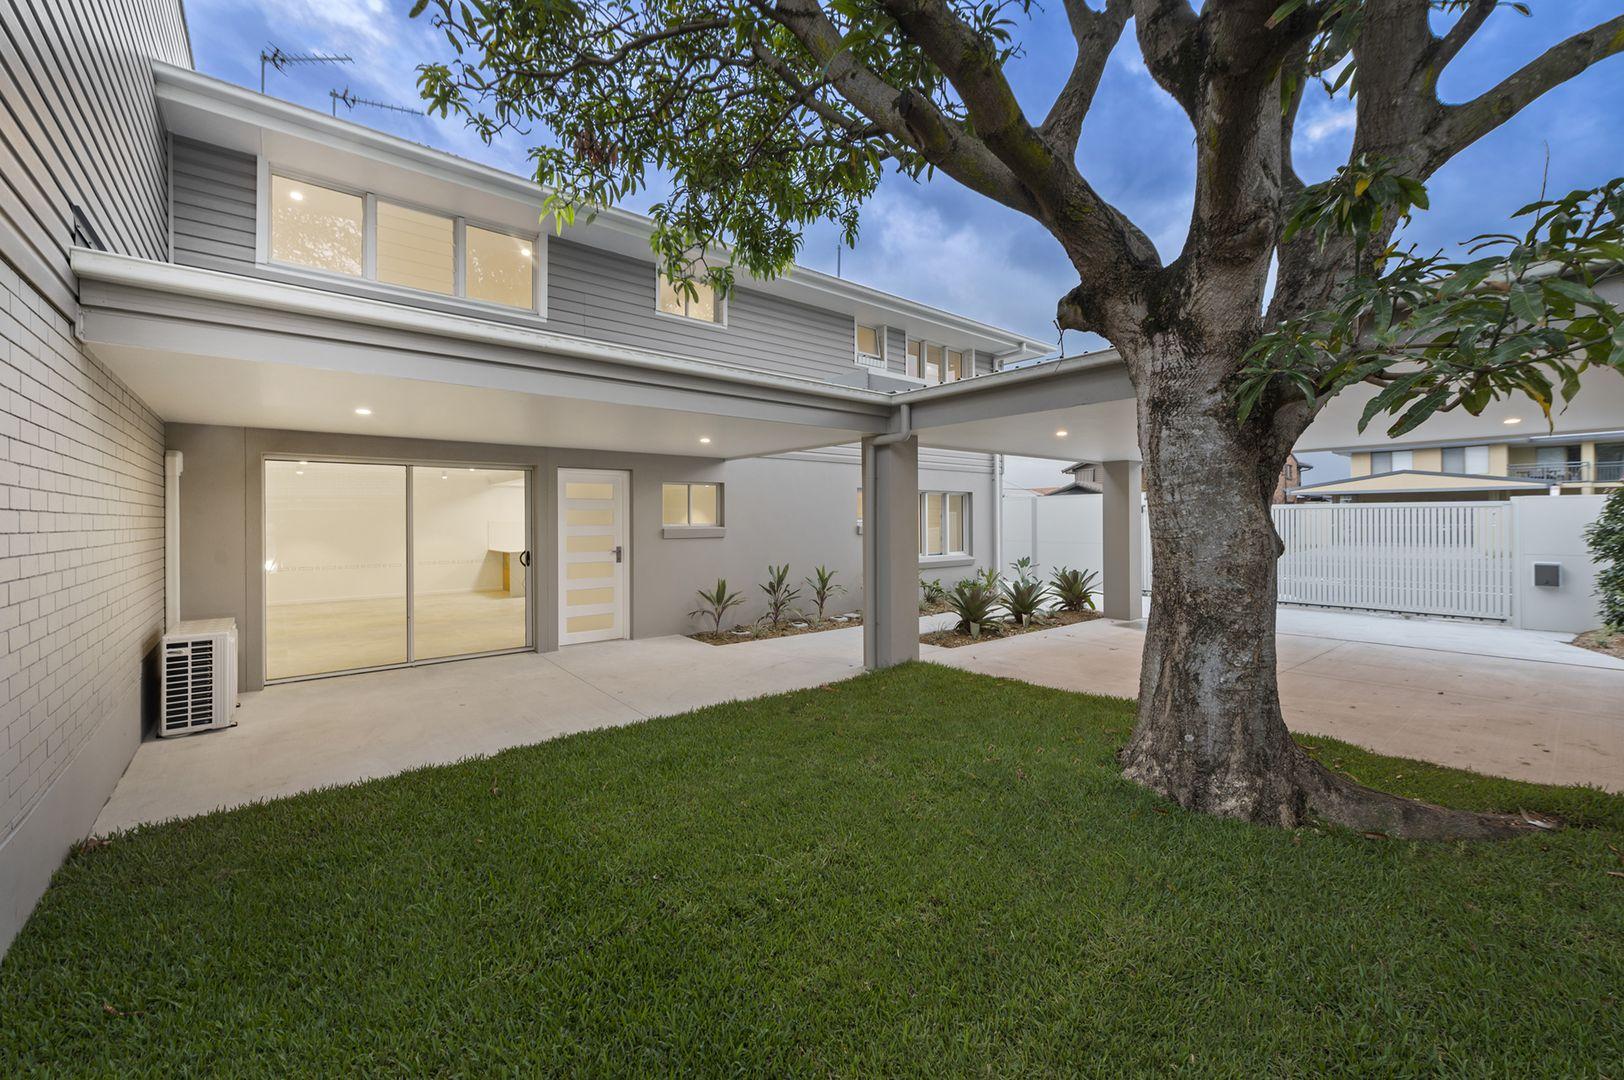 391 Bayview Street Street, Hollywell QLD 4216, Image 0